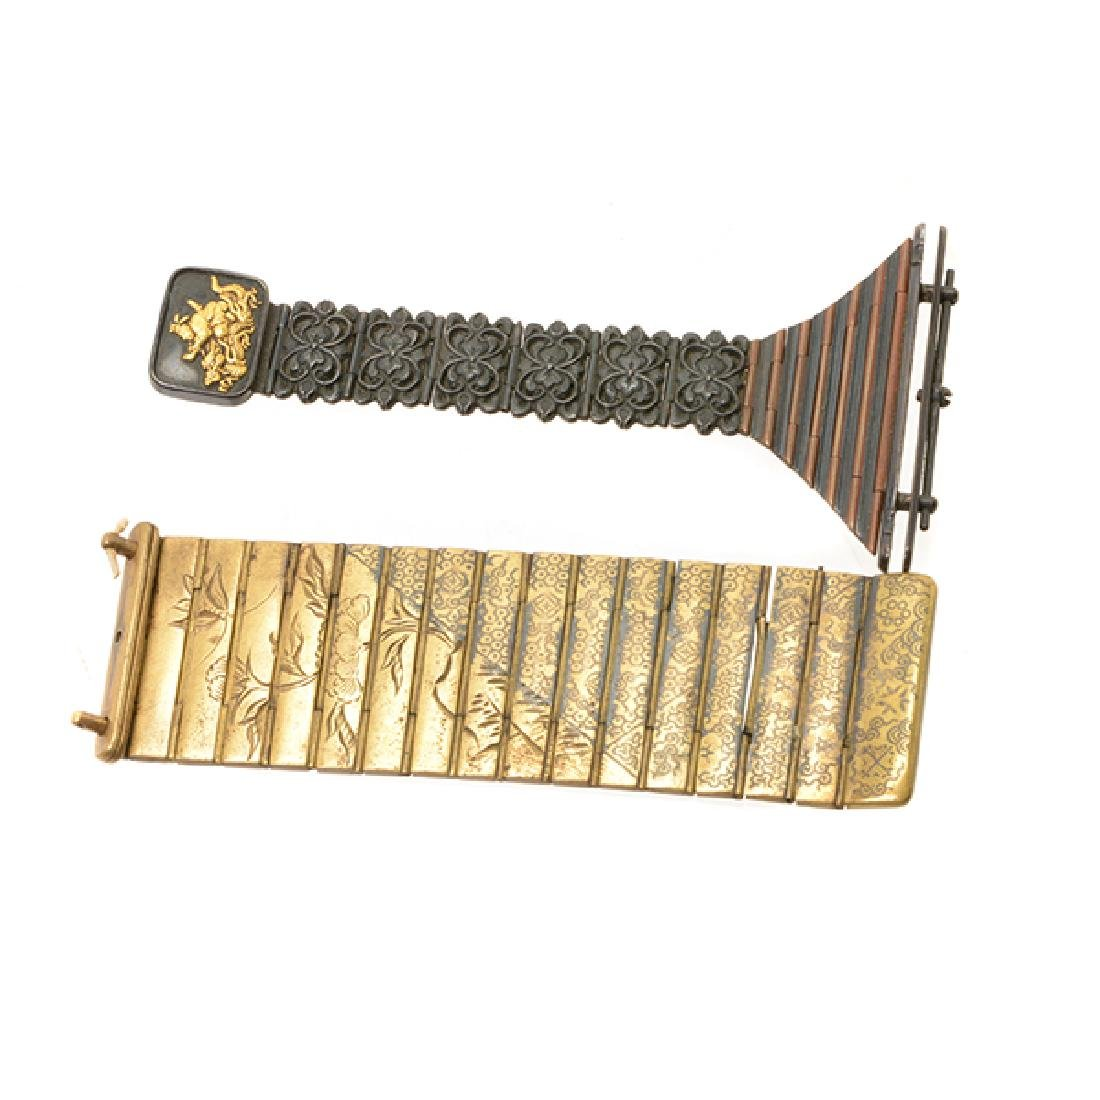 Two Metal Netsuke Applique Chains, Meiji Period